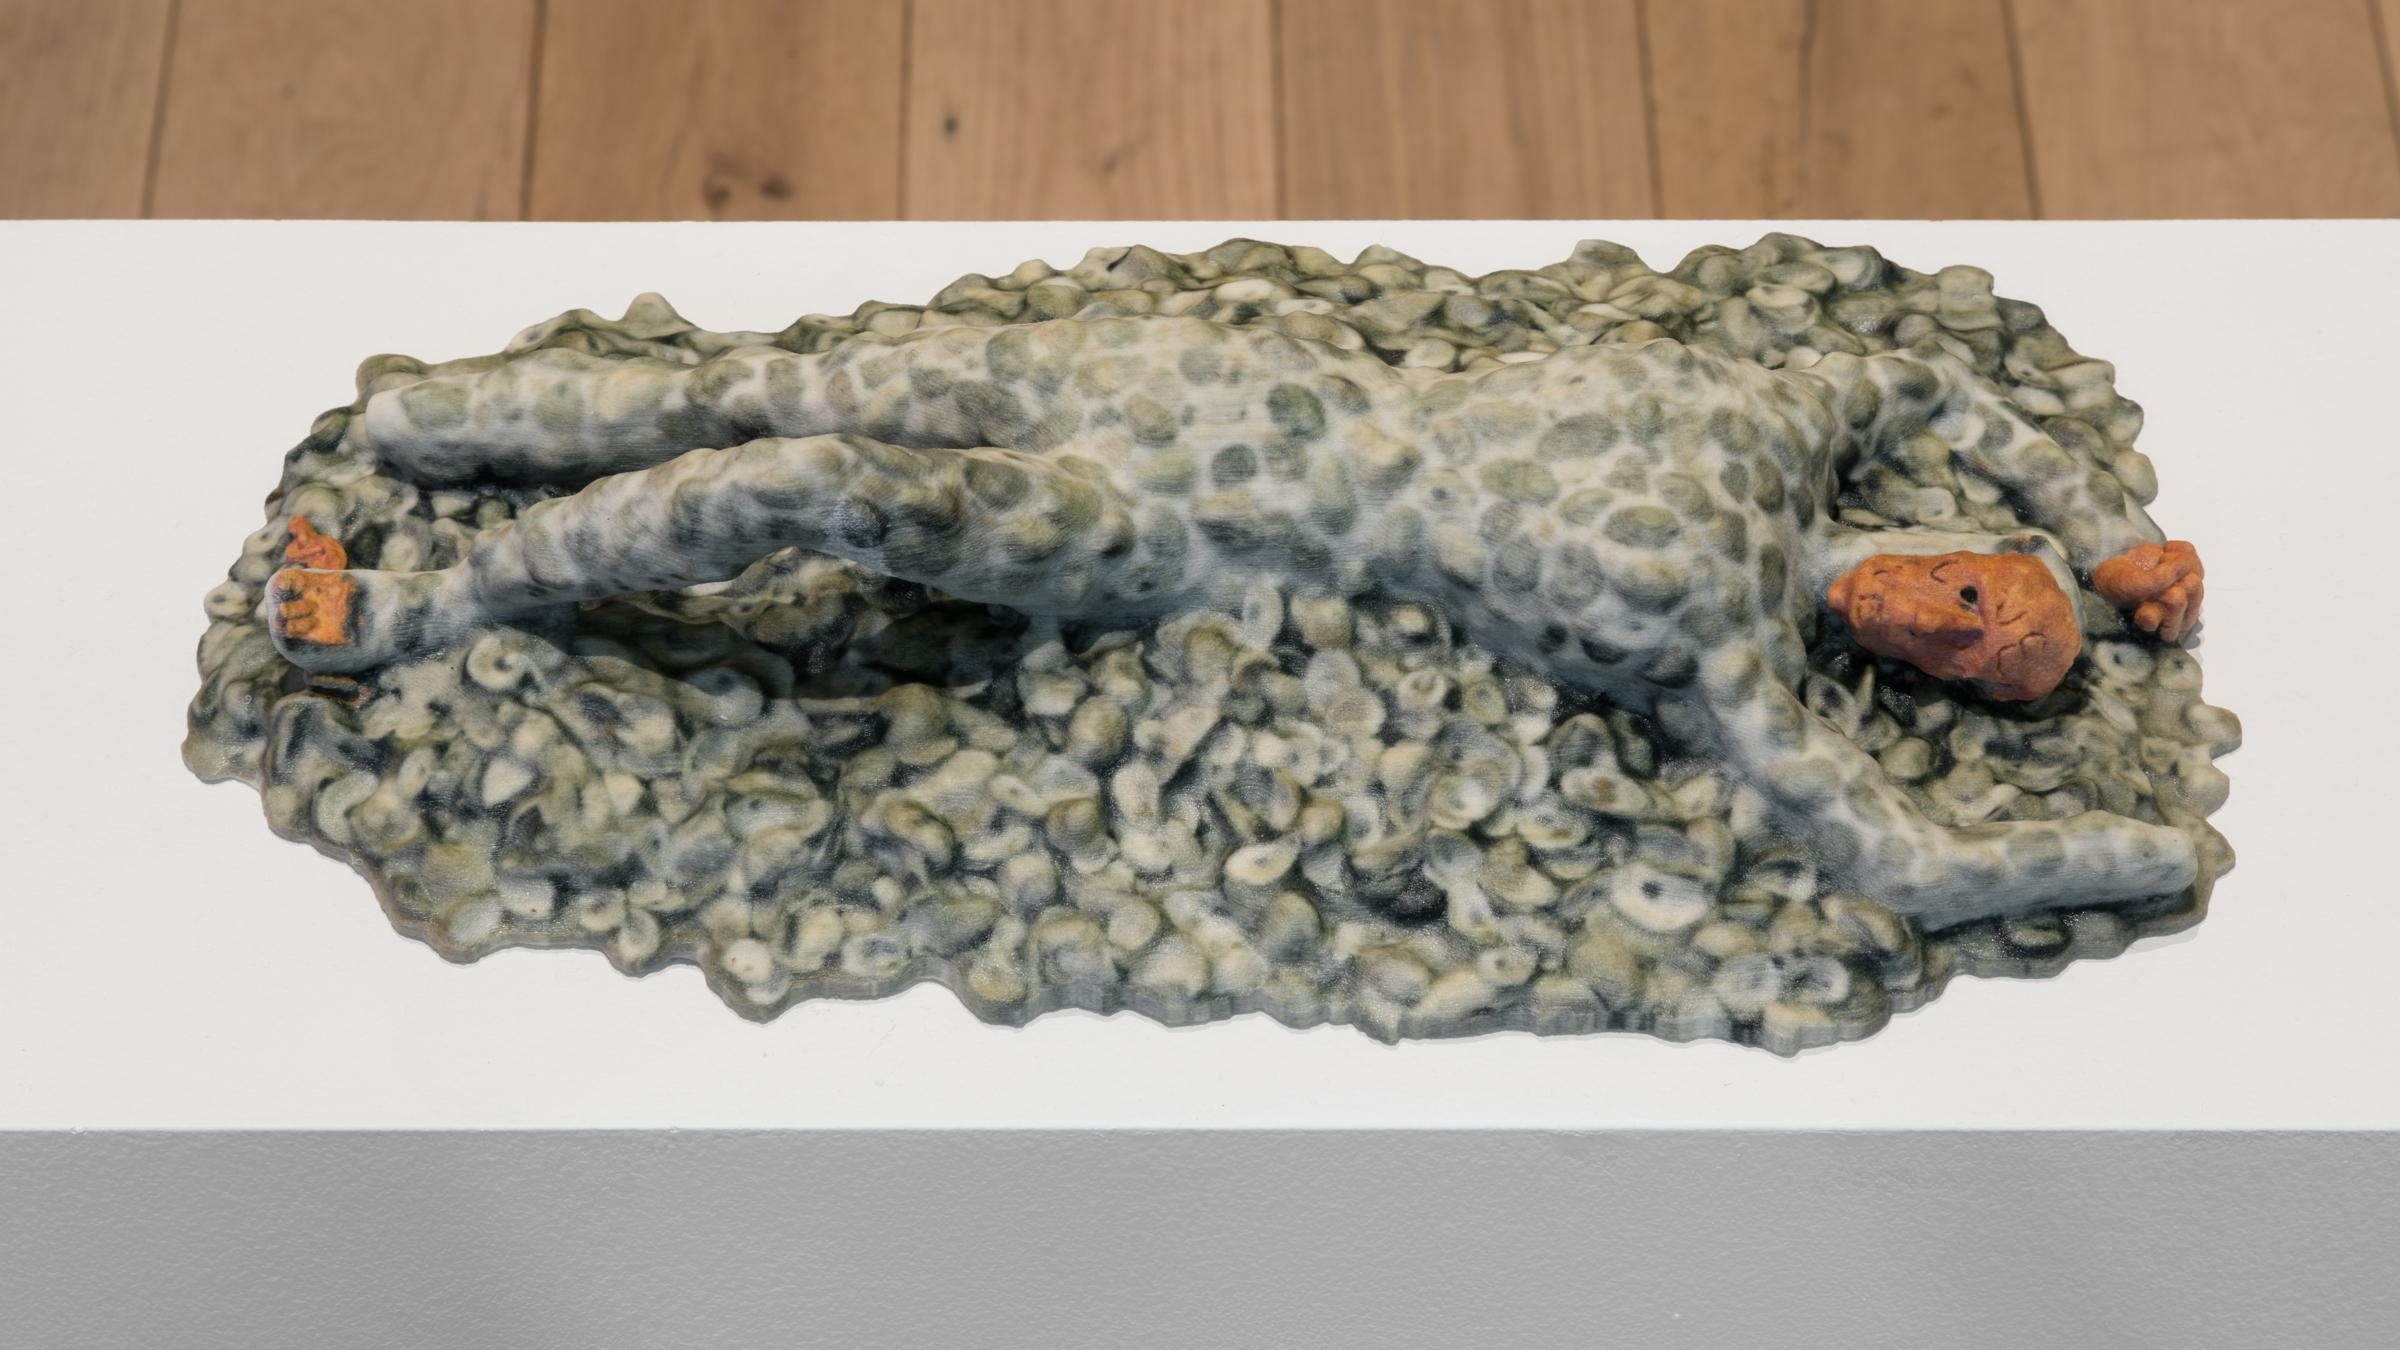 Jory Rabinovitz,   Death of Abel oikos , 2018, 3-D Print, 2 ¾ × 14 ½ × 8 in.